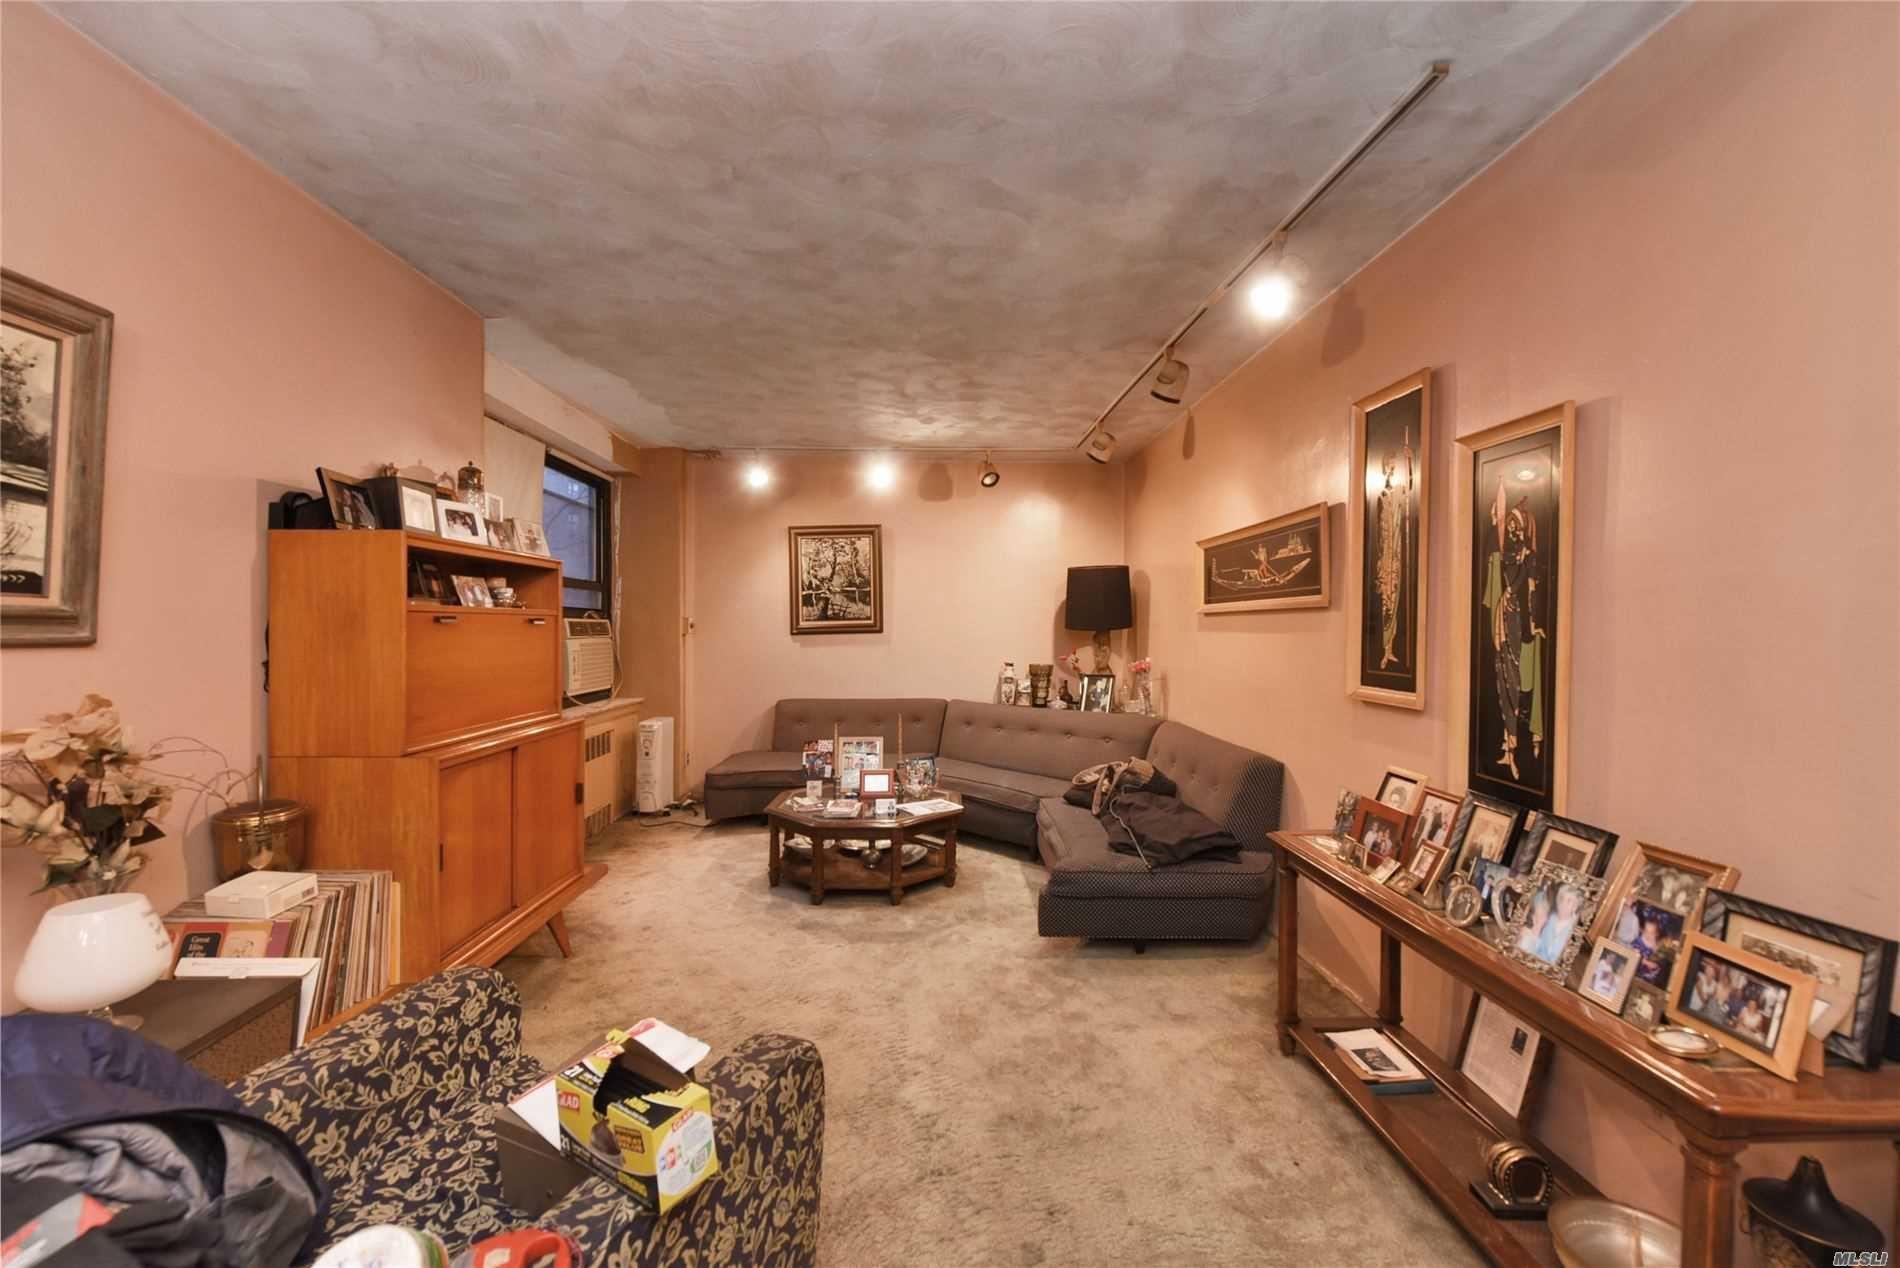 139-09 28th Road #1G, Flushing, NY 11354 - MLS#: 3194598